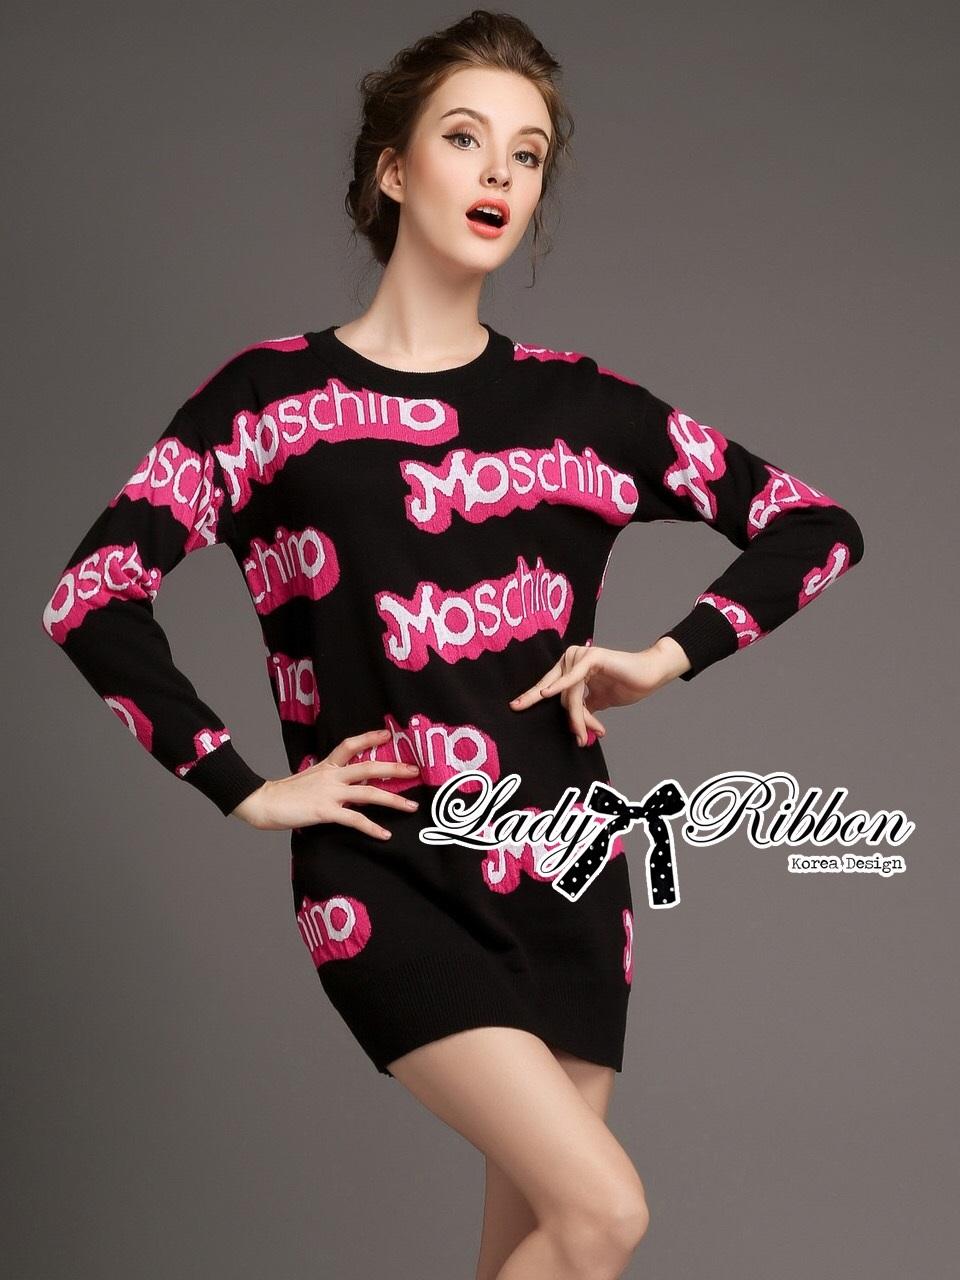 Barbie Girl Sweater Dress เดรสสเวตเตอร์ทอลายสไตล์ Moschino